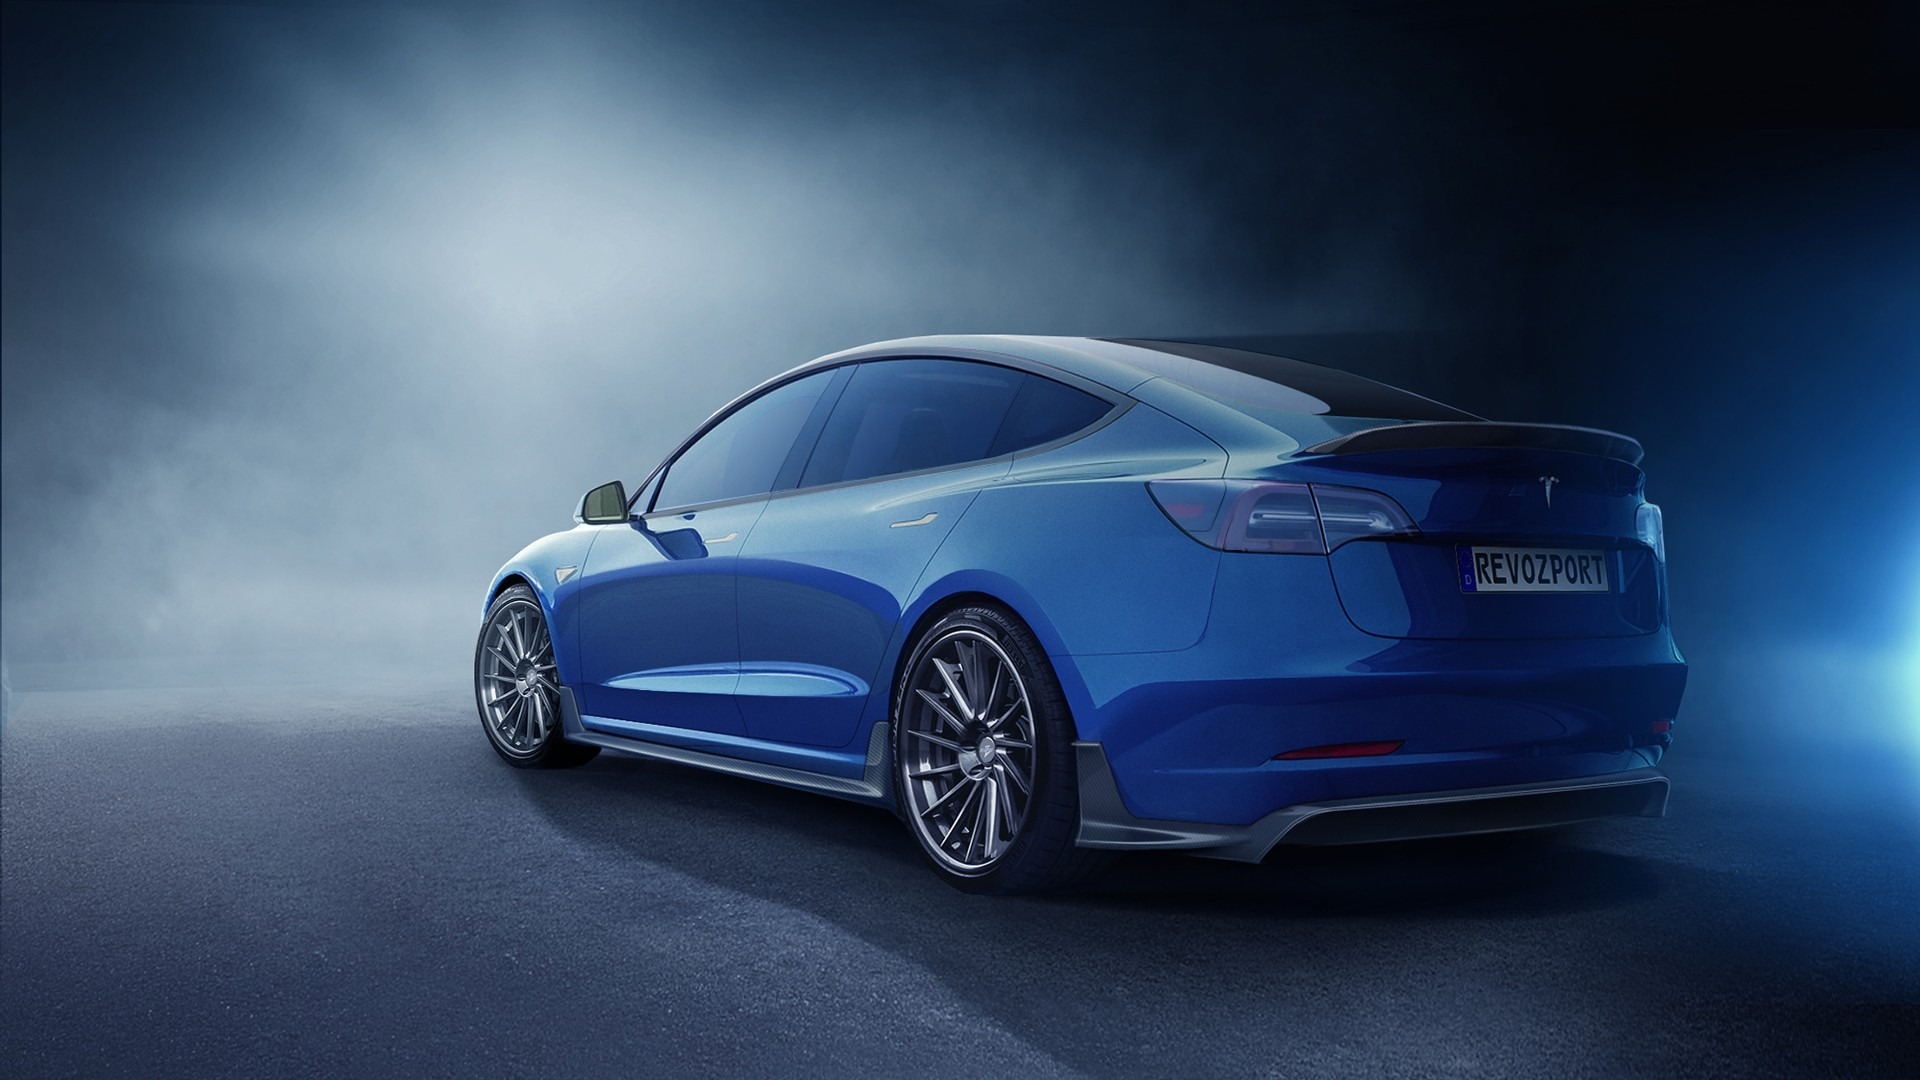 RevoZport Offers Two Body Kits For Tesla's Model 3 ...